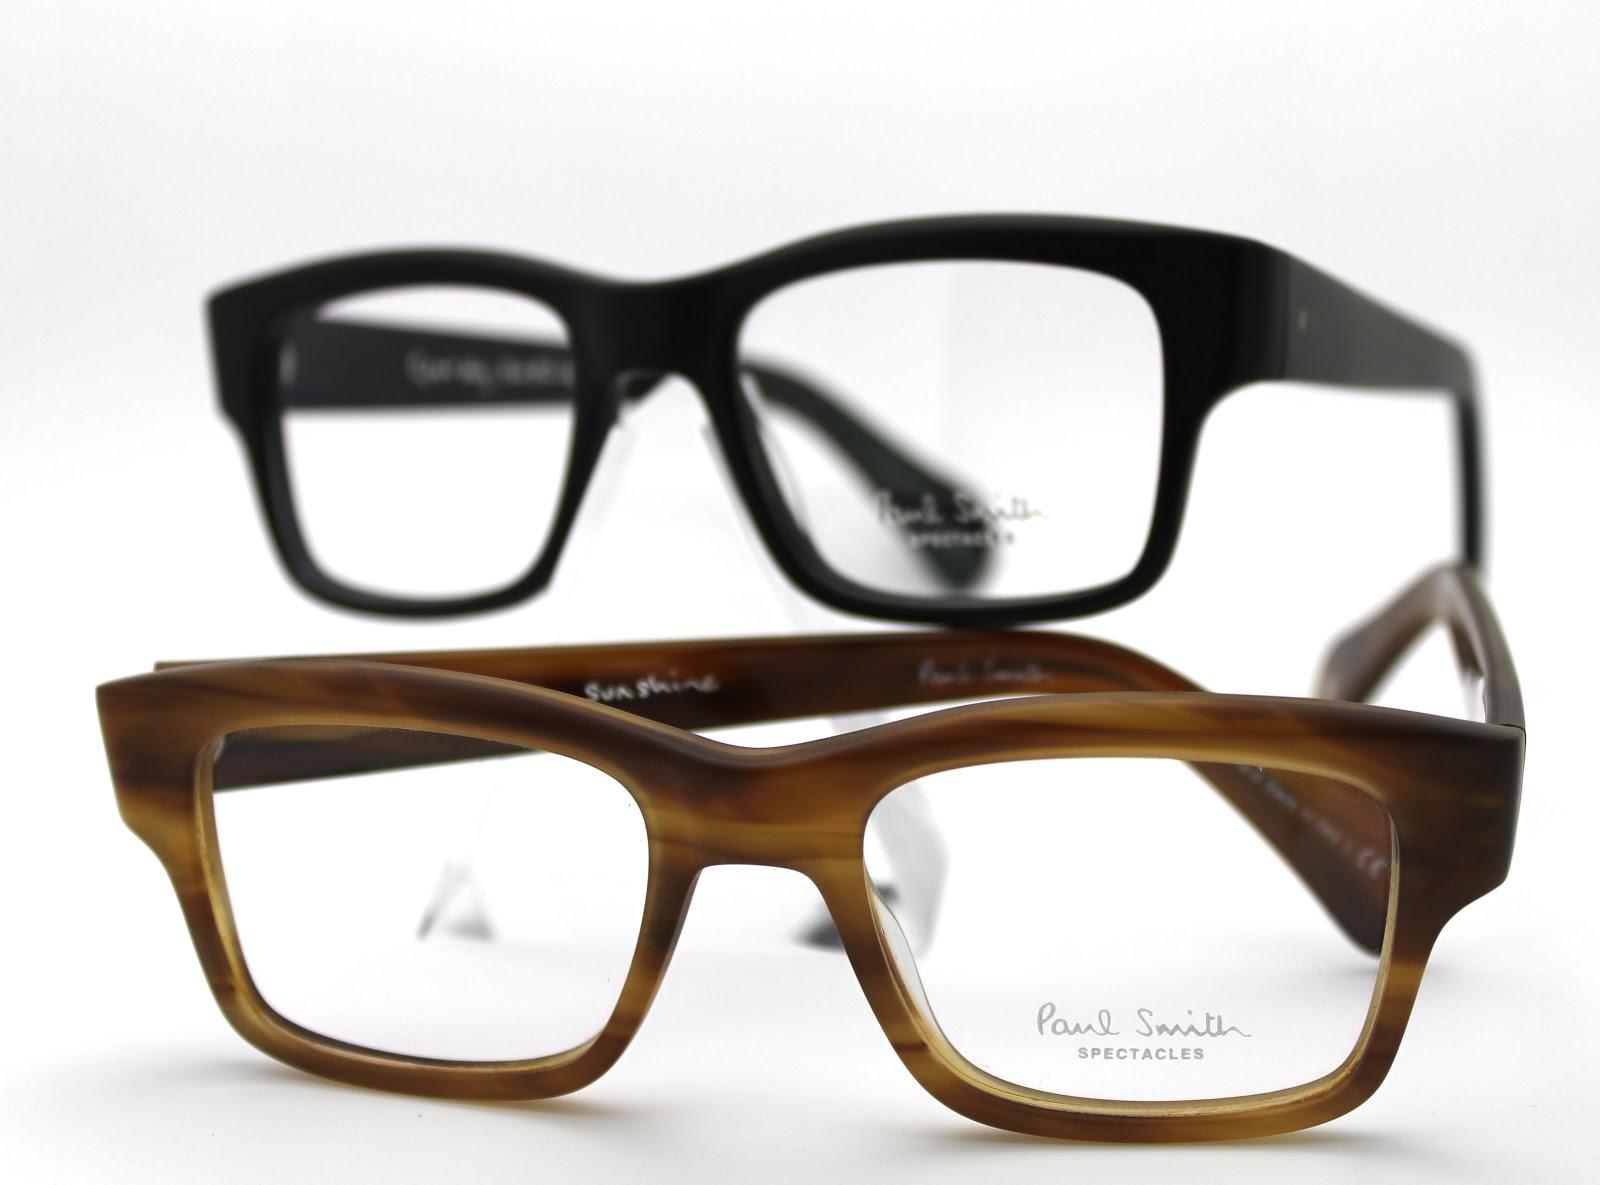 ed5ab7815c Paul Smith Eyeglasses Frames - Bitterroot Public Library